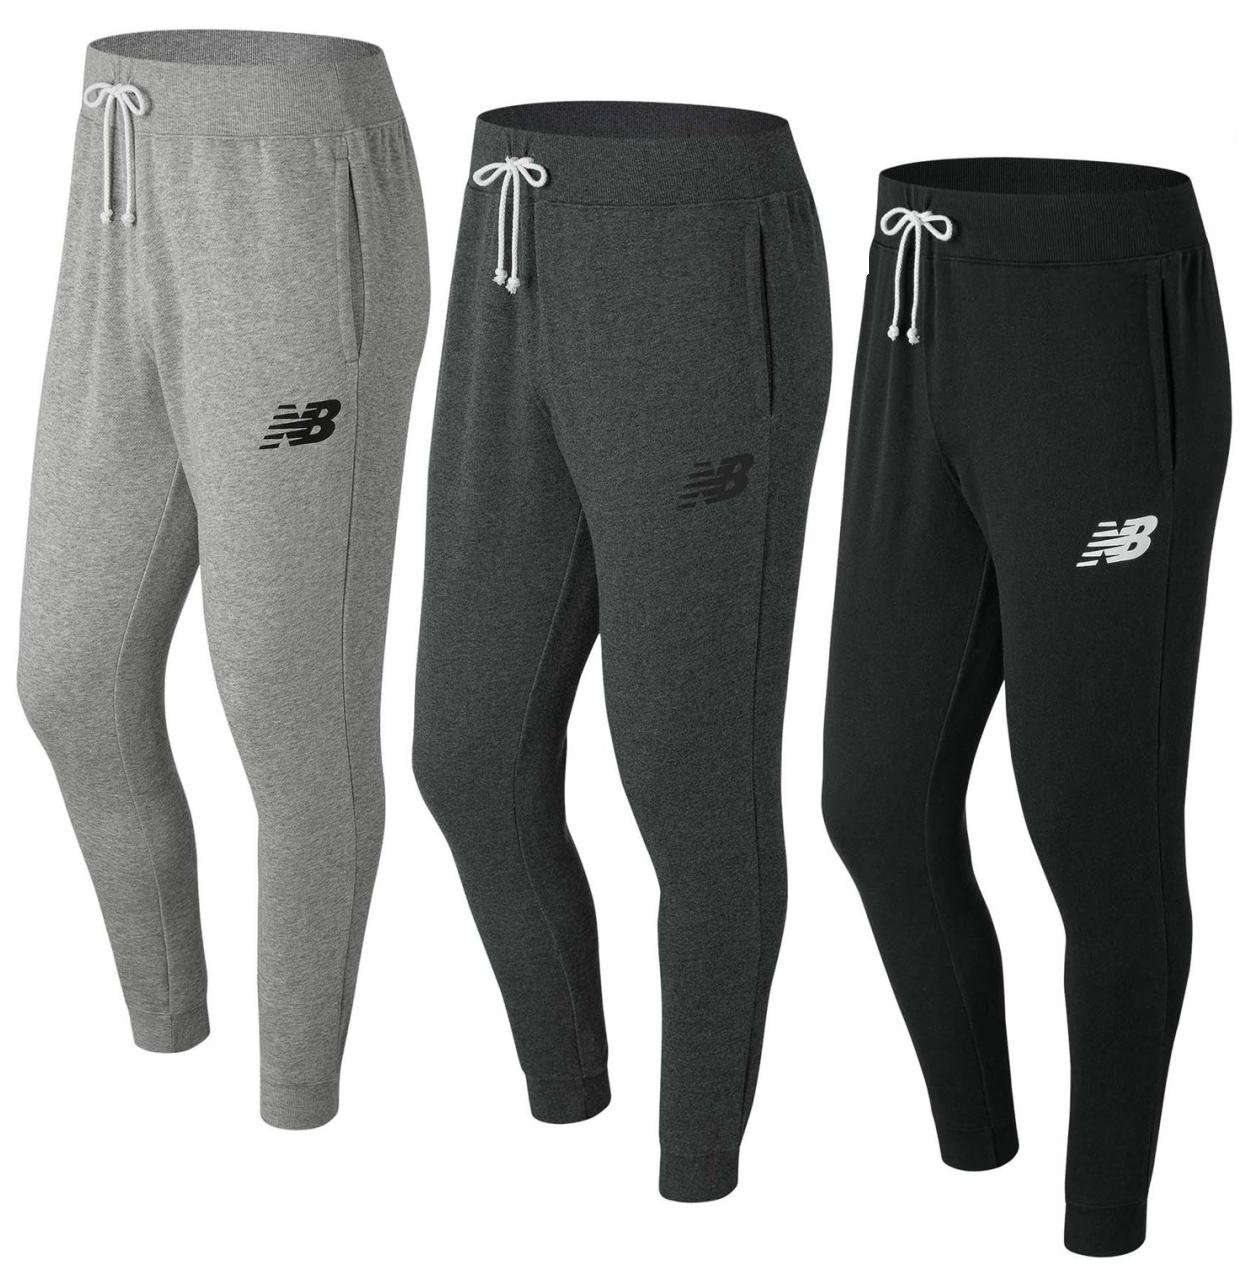 NEW Balance Allenamento Pantaloni Jogging Pantaloni Pantaloni Sportivi Pantaloni Da Uomo Fitness Slim 2054